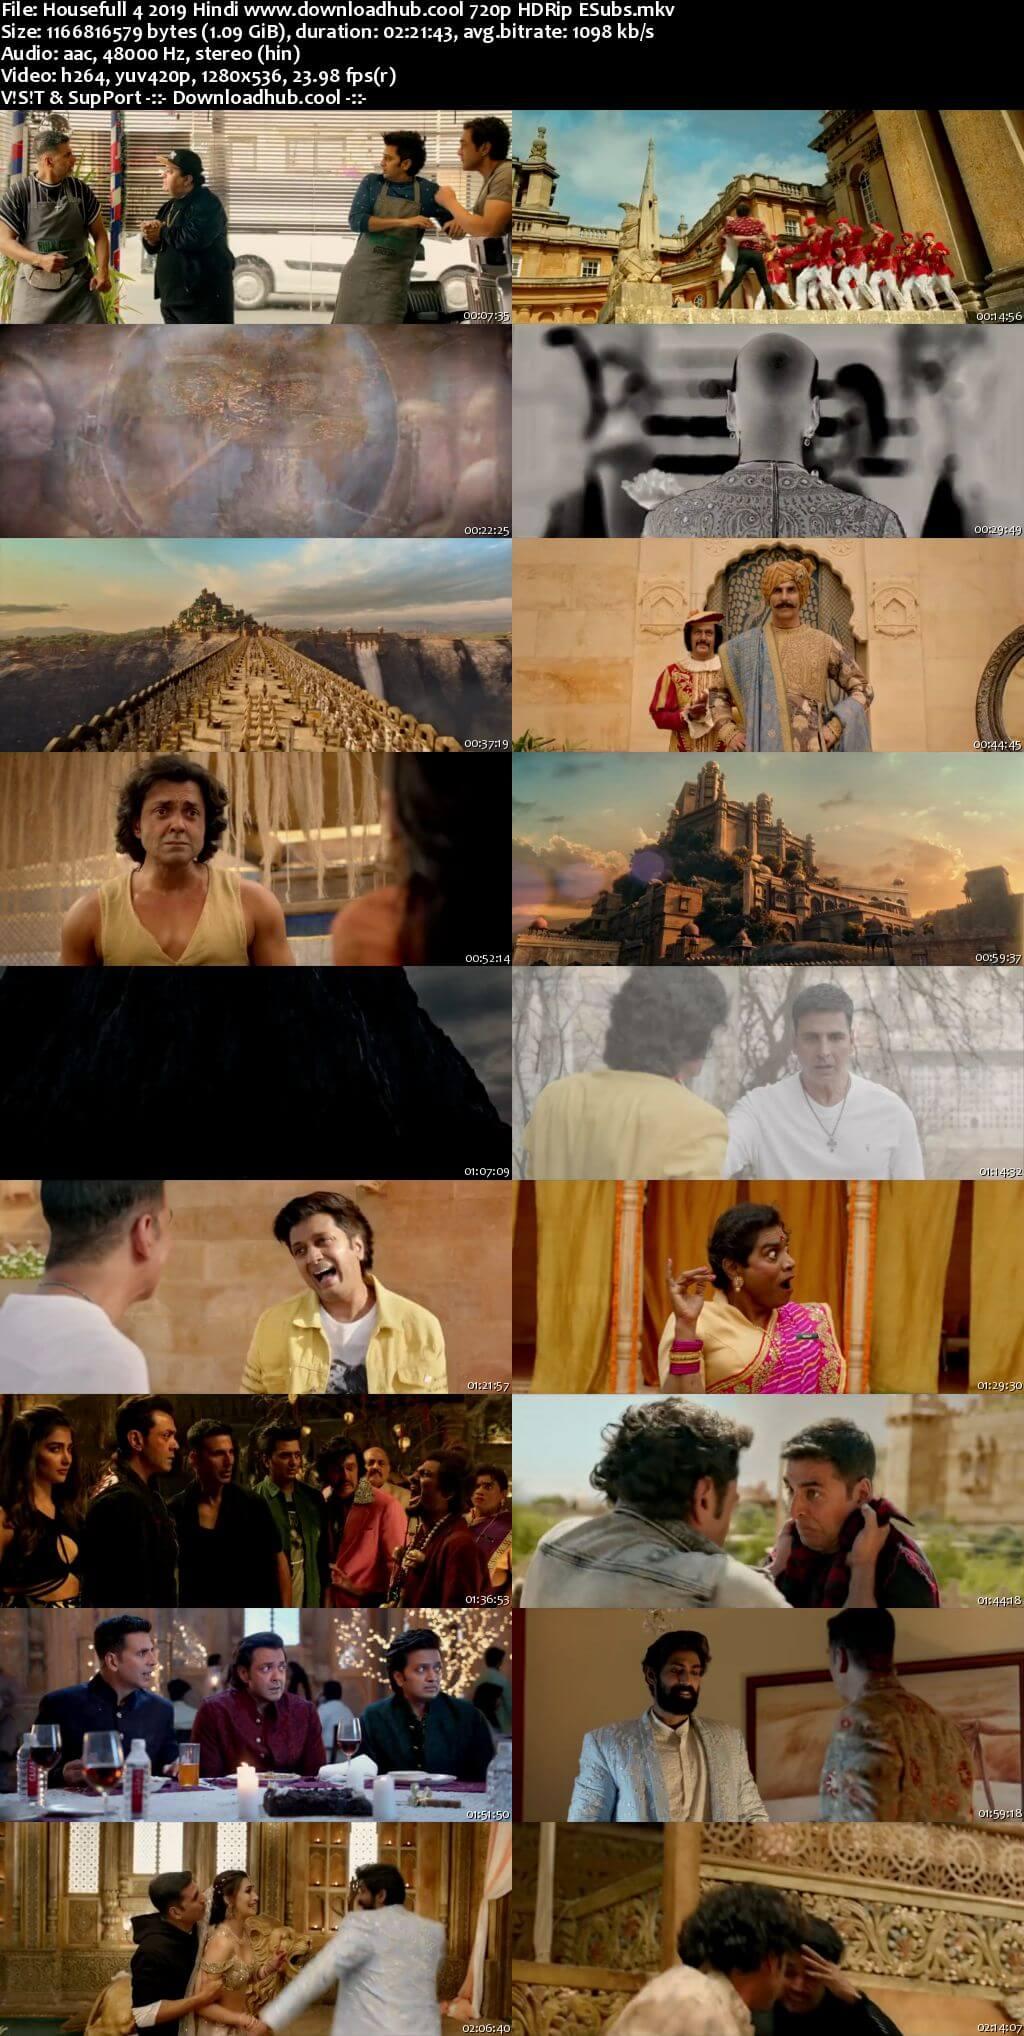 Housefull 4 2019 Hindi 720p HDRip ESubs